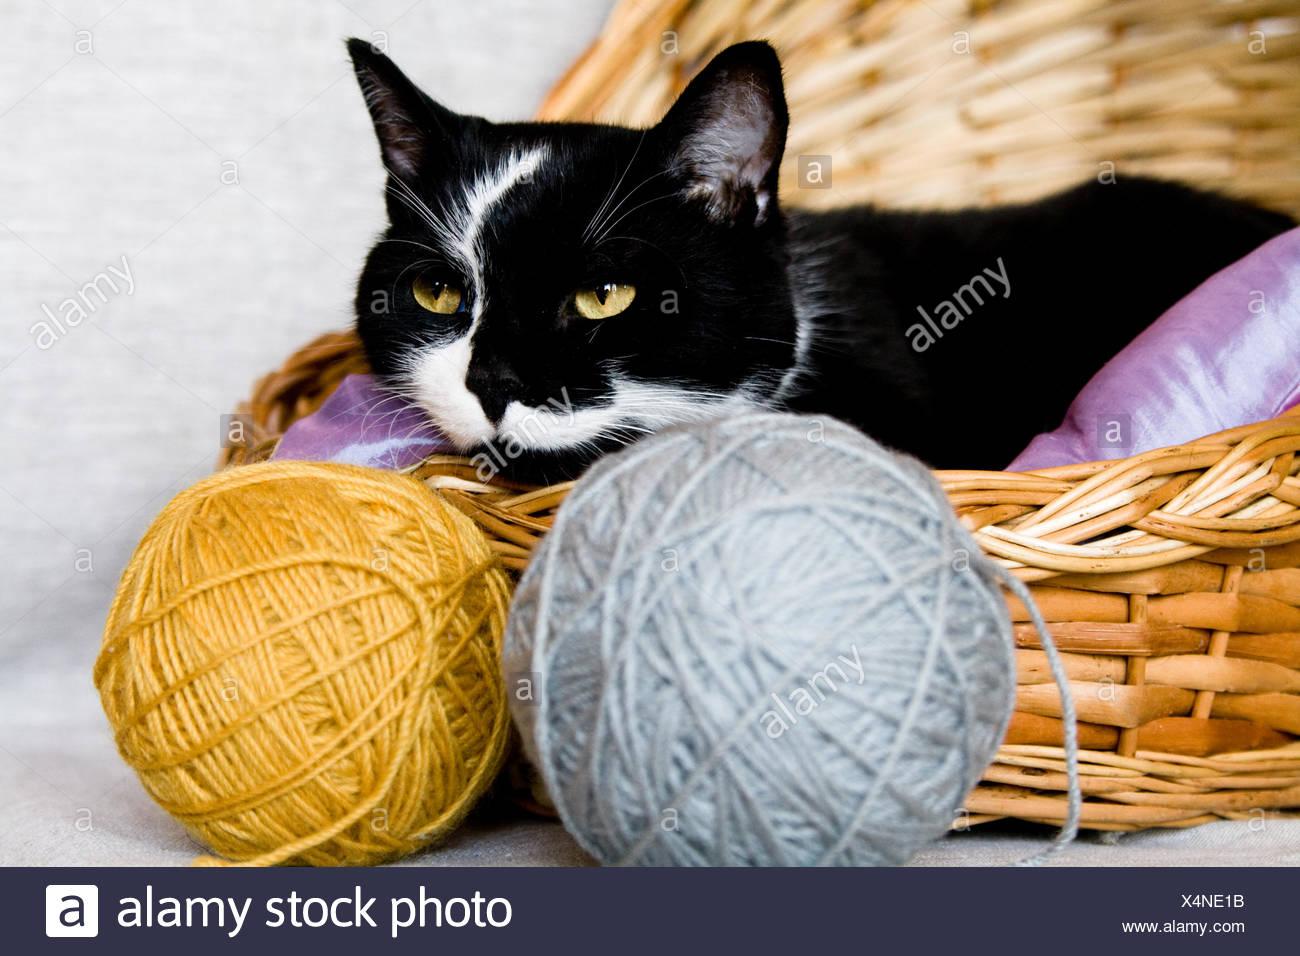 Cat In Knitting Stockfotos & Cat In Knitting Bilder - Alamy